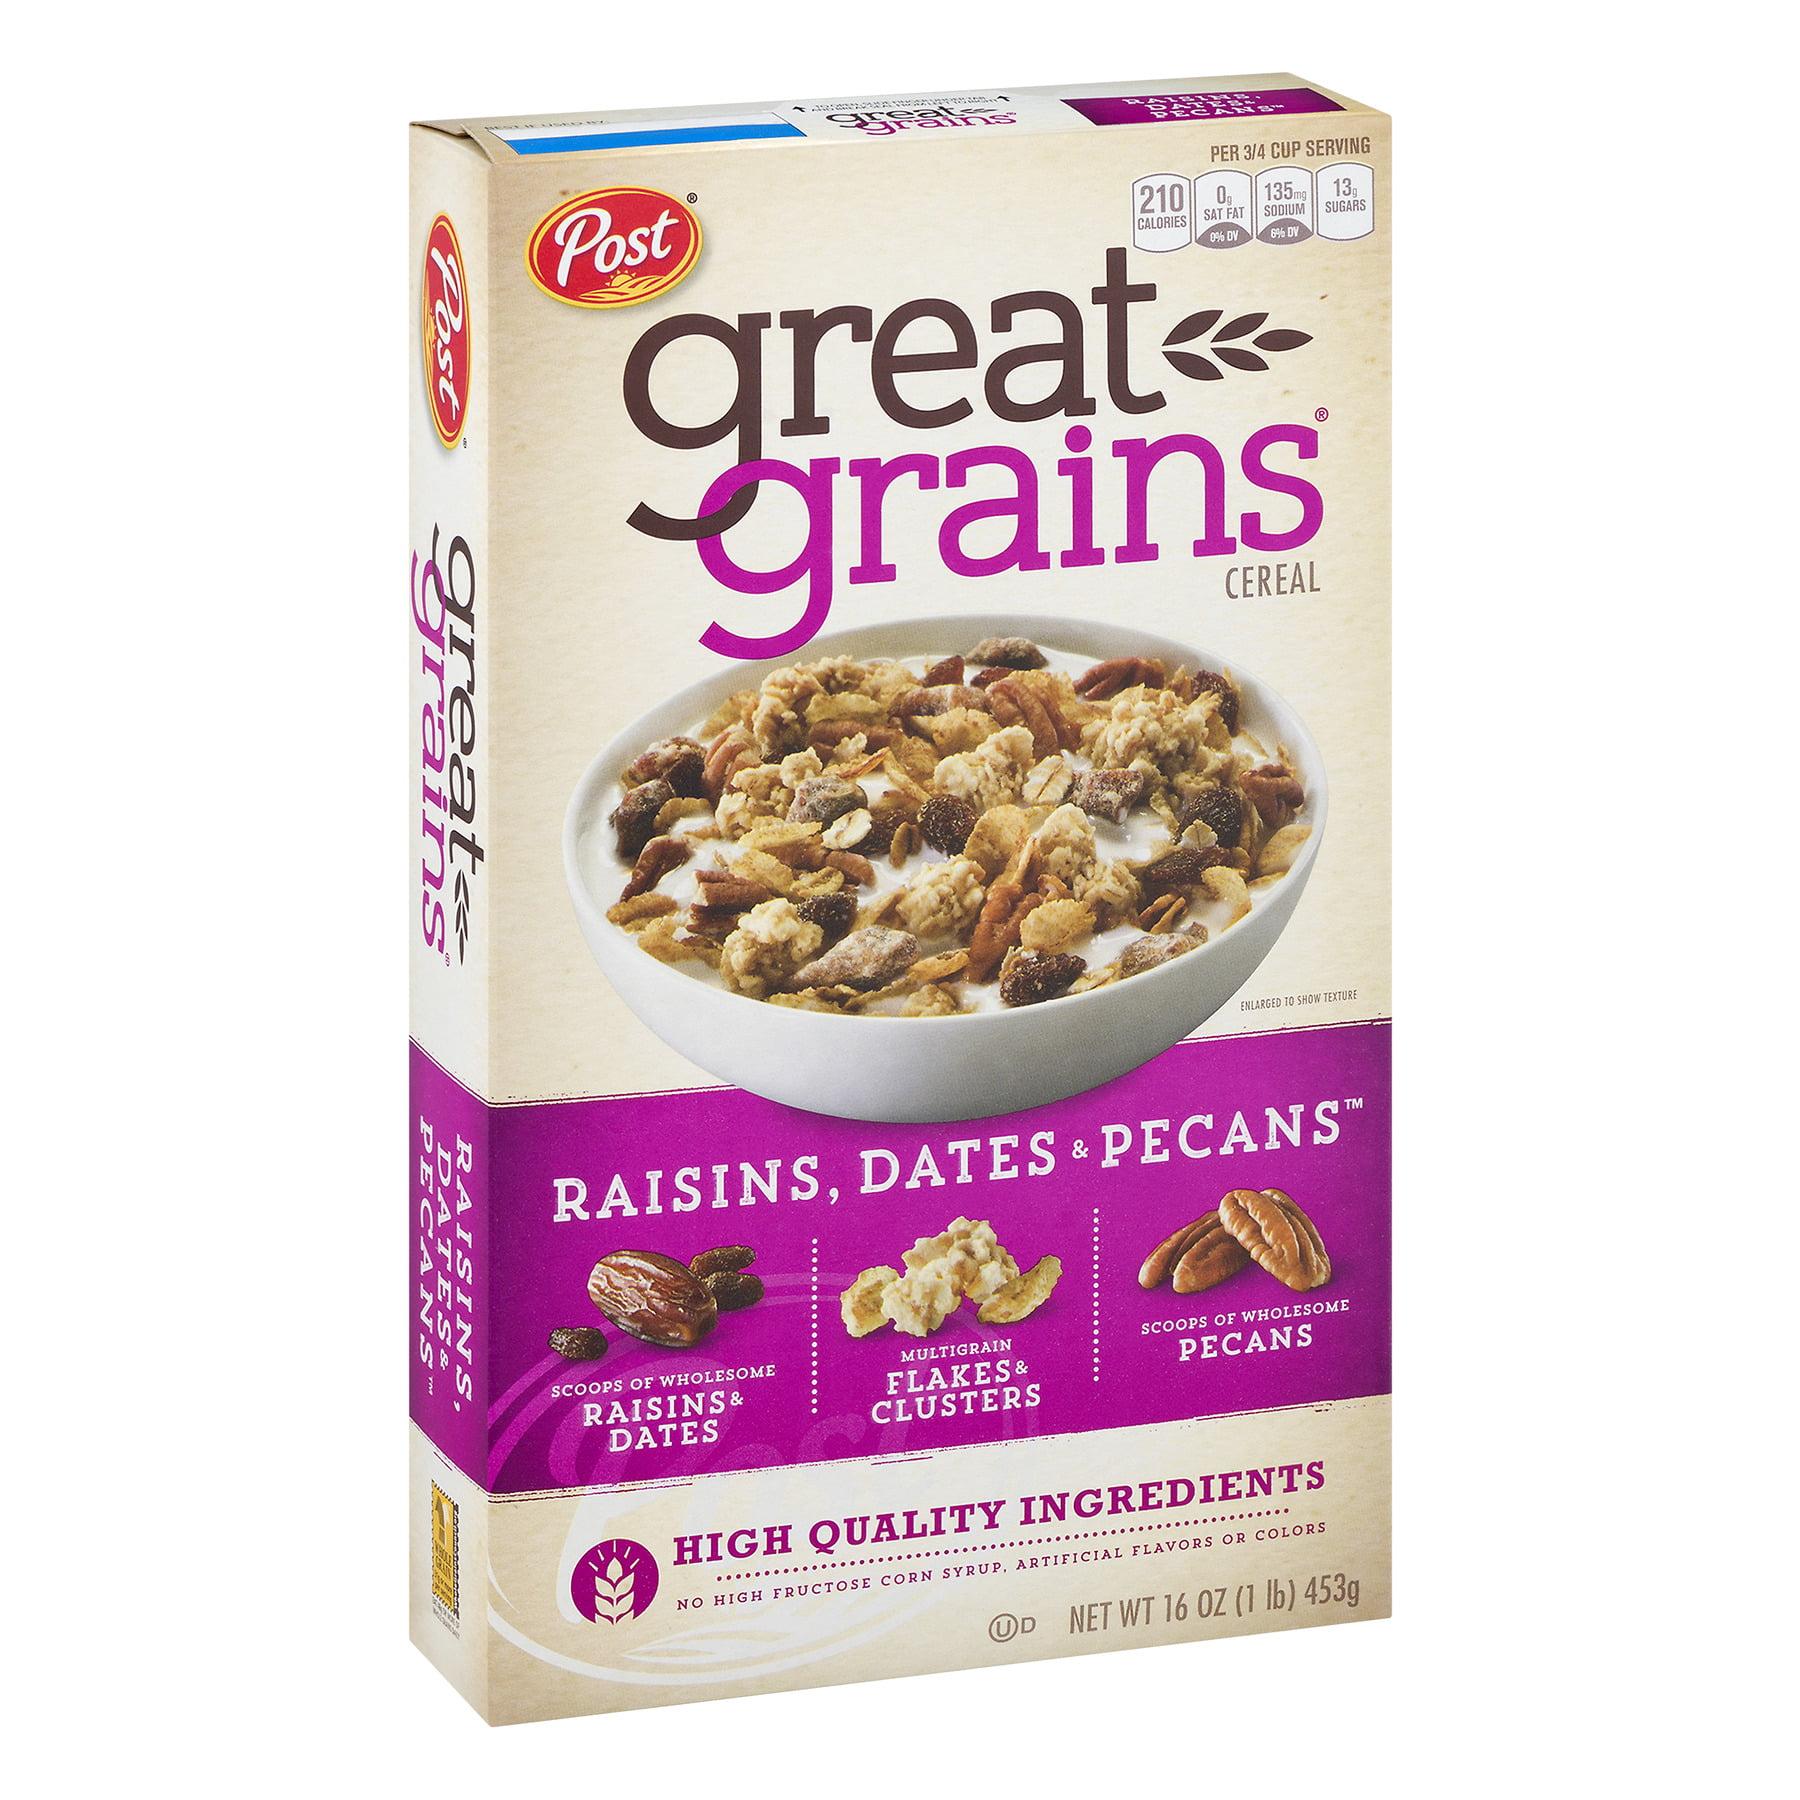 Post Great Grains Breakfast Cereal, Raisins, Dates & Pecans, 16 Oz